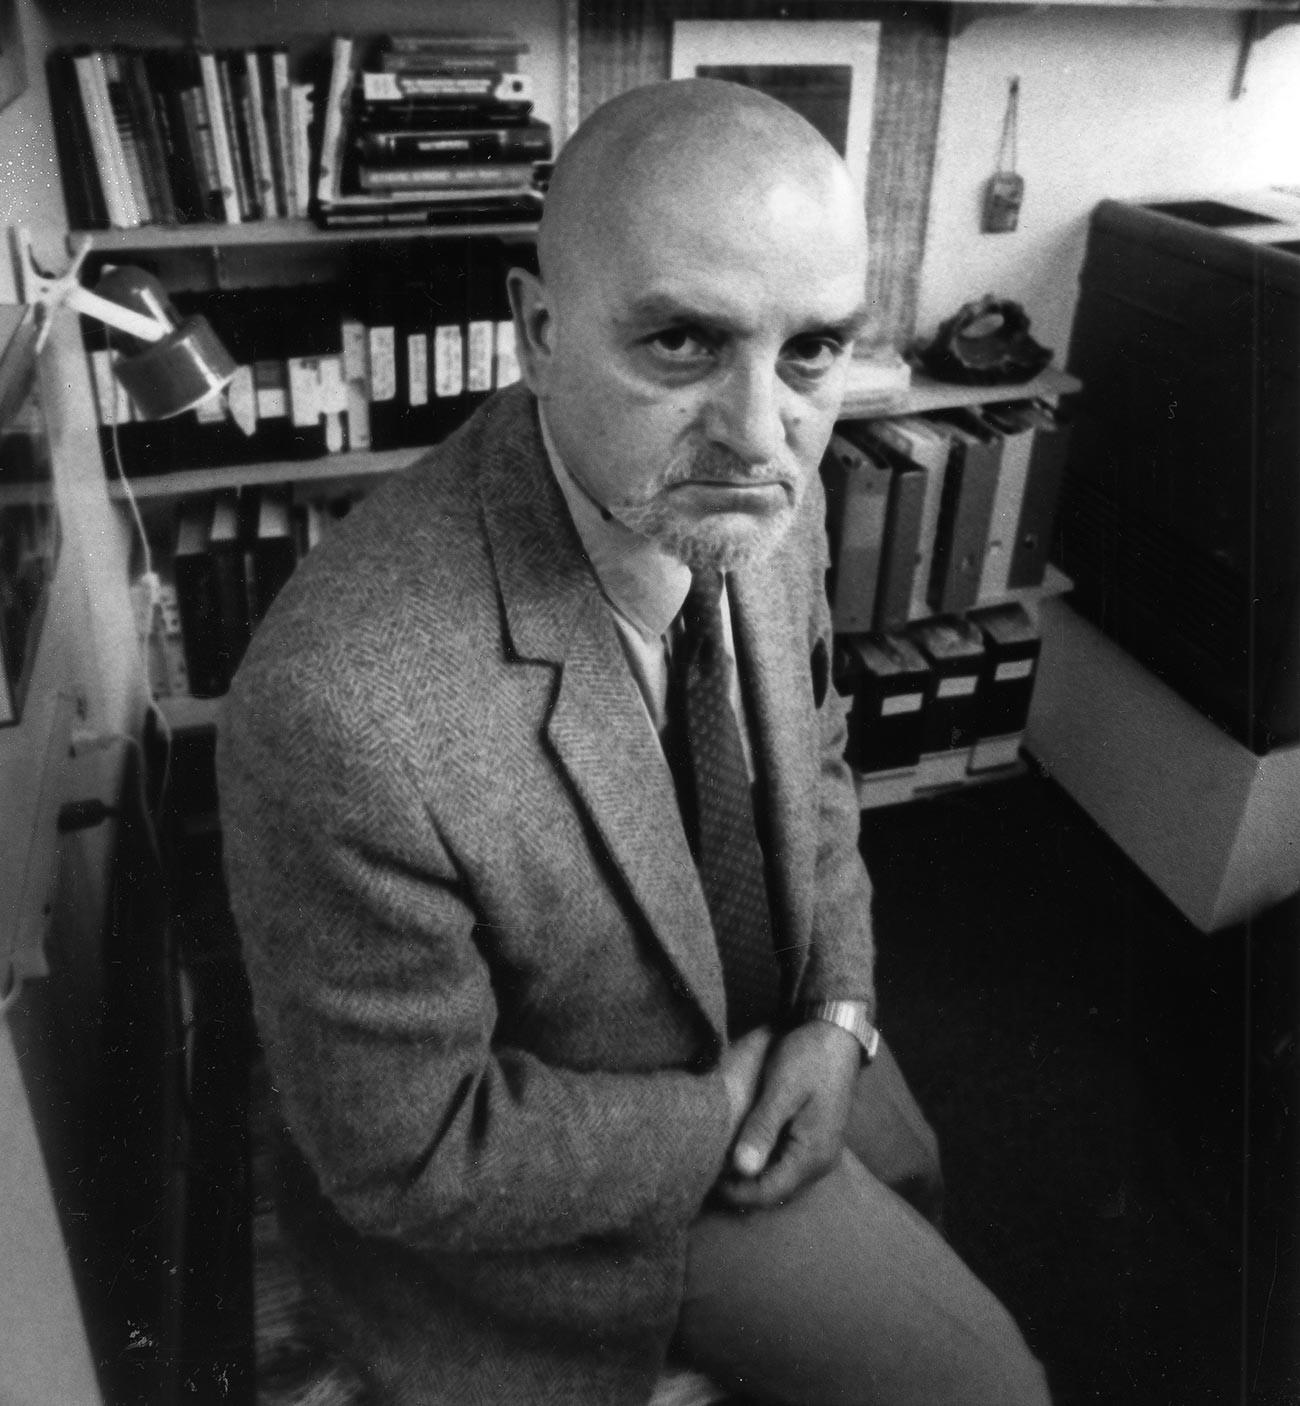 Lawrence Martin-Bittman